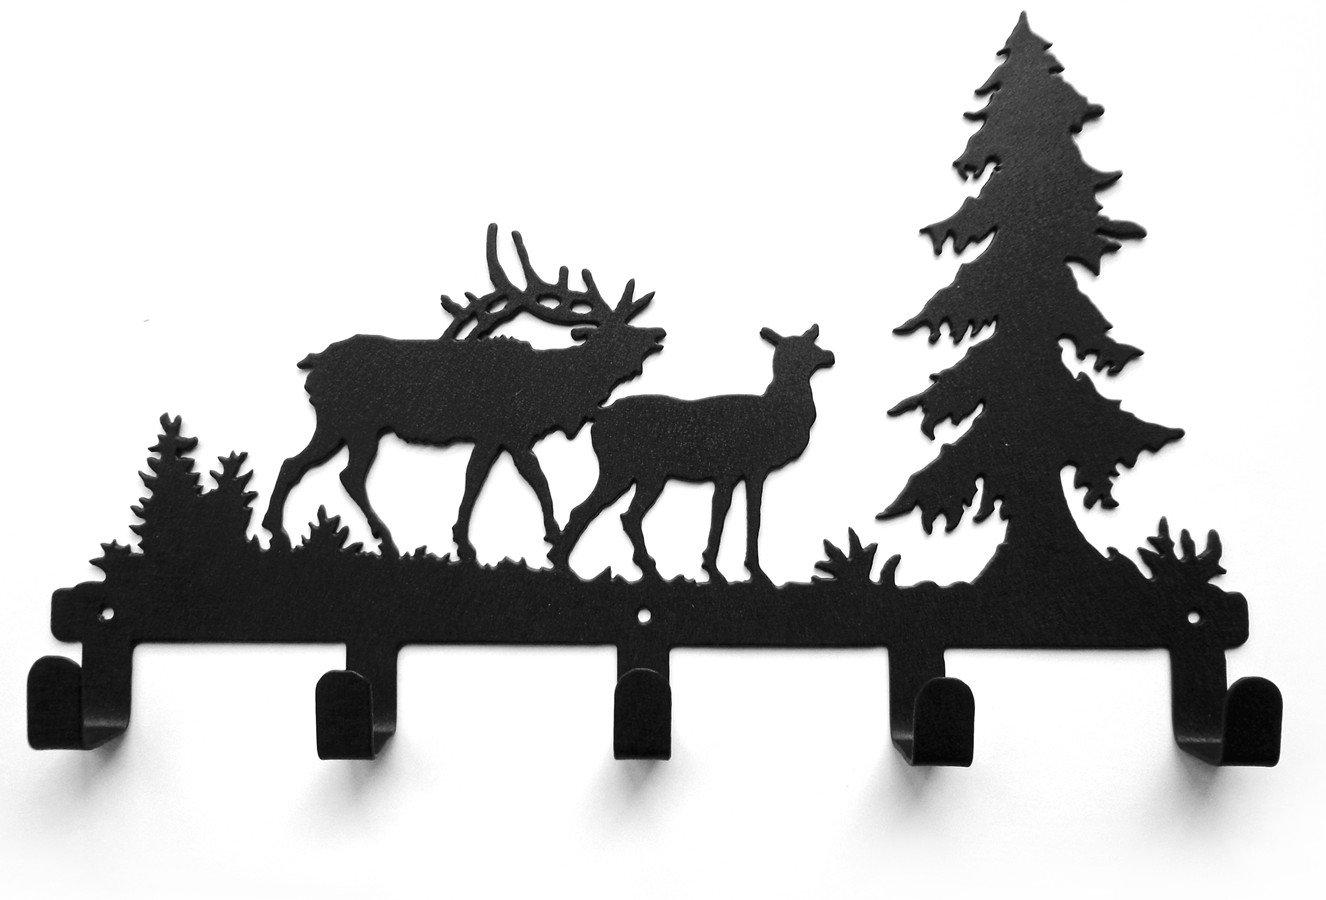 Metal Wall Mounted Bag Hanger Towels Rack Originality Deer Pine Decorative Wall Hook Clothing Hooks Matt Black